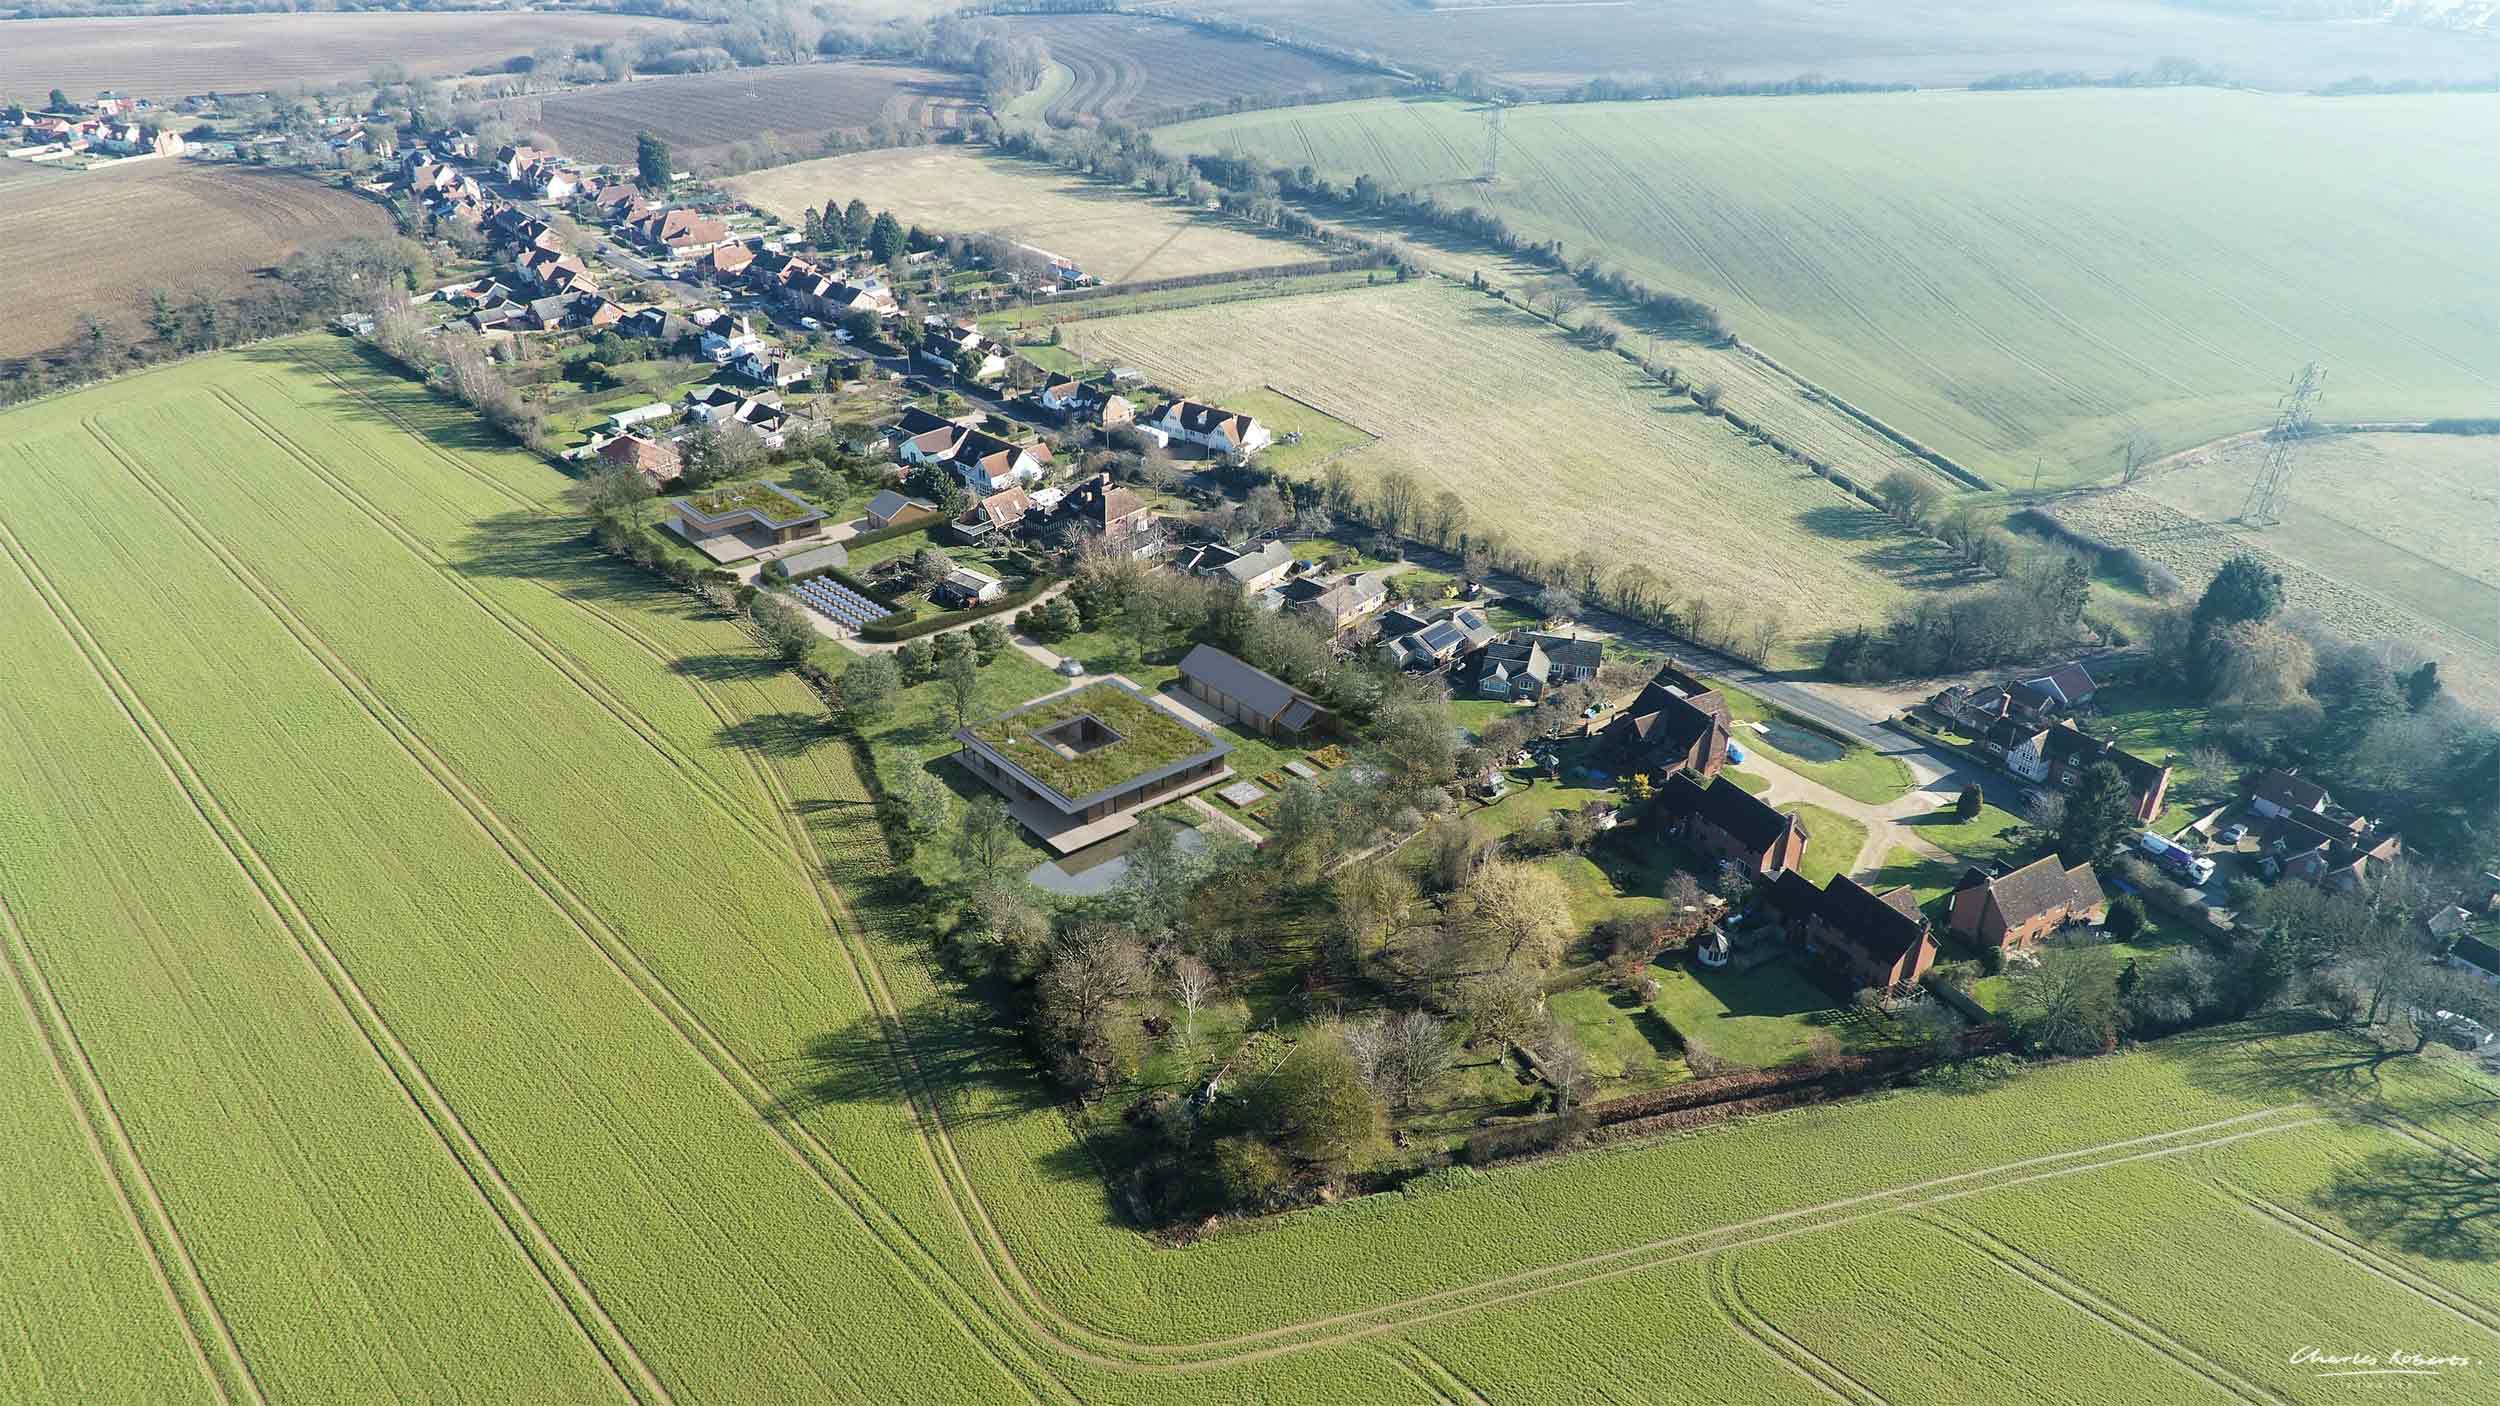 Aerial-visualisation-new-eco-property-development.jpg